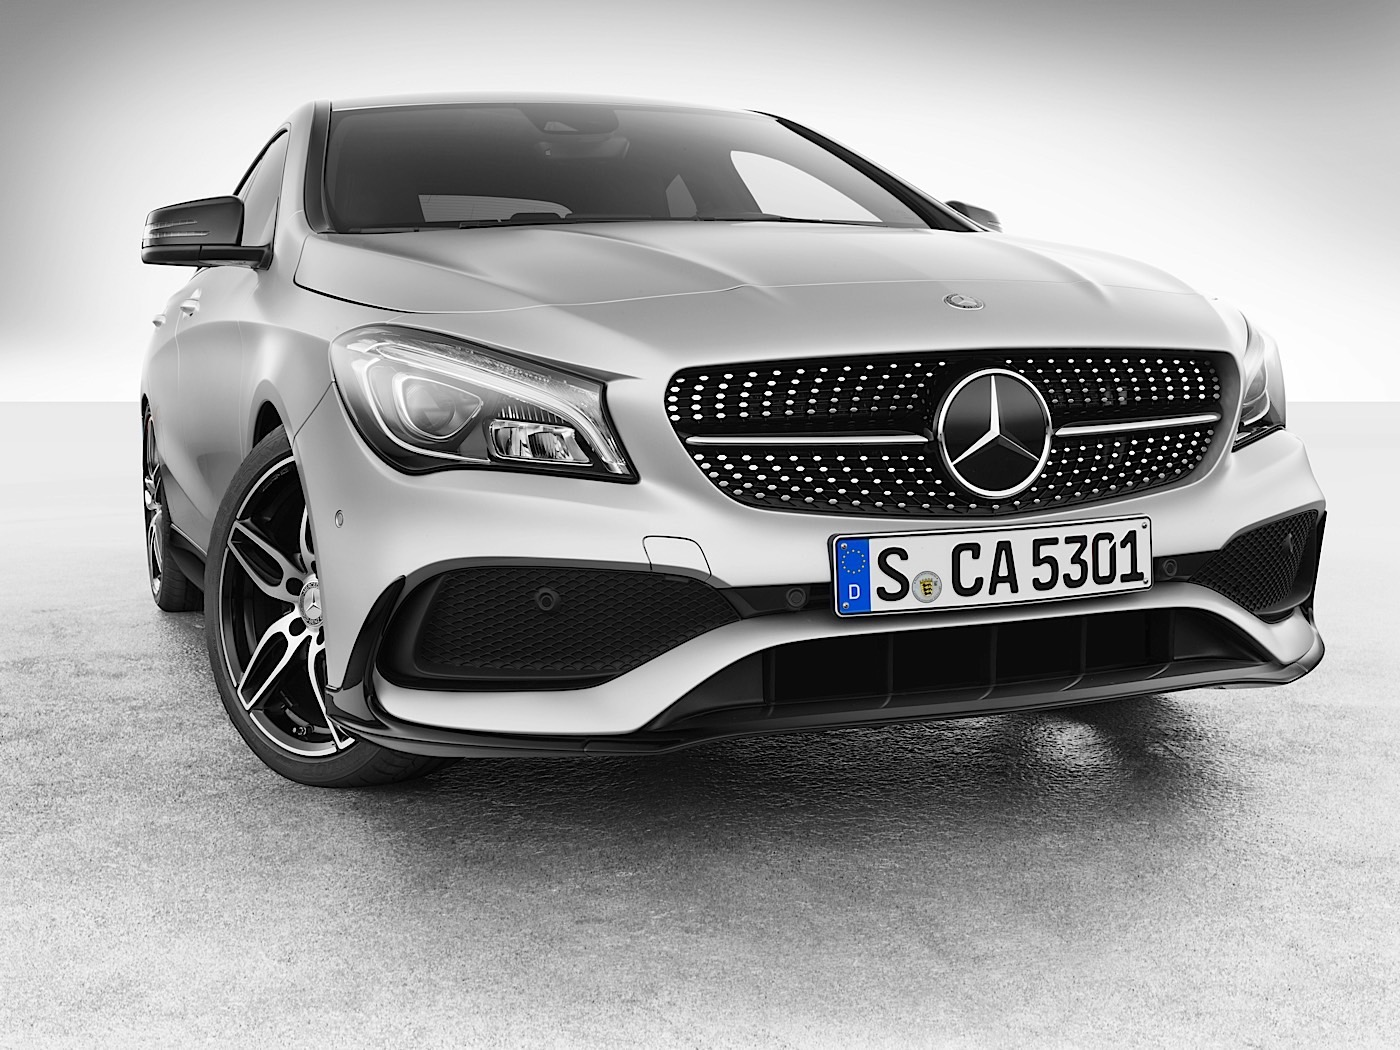 Non amg mercedes benz cla models get more show no go for Mercedes benz amg accessories